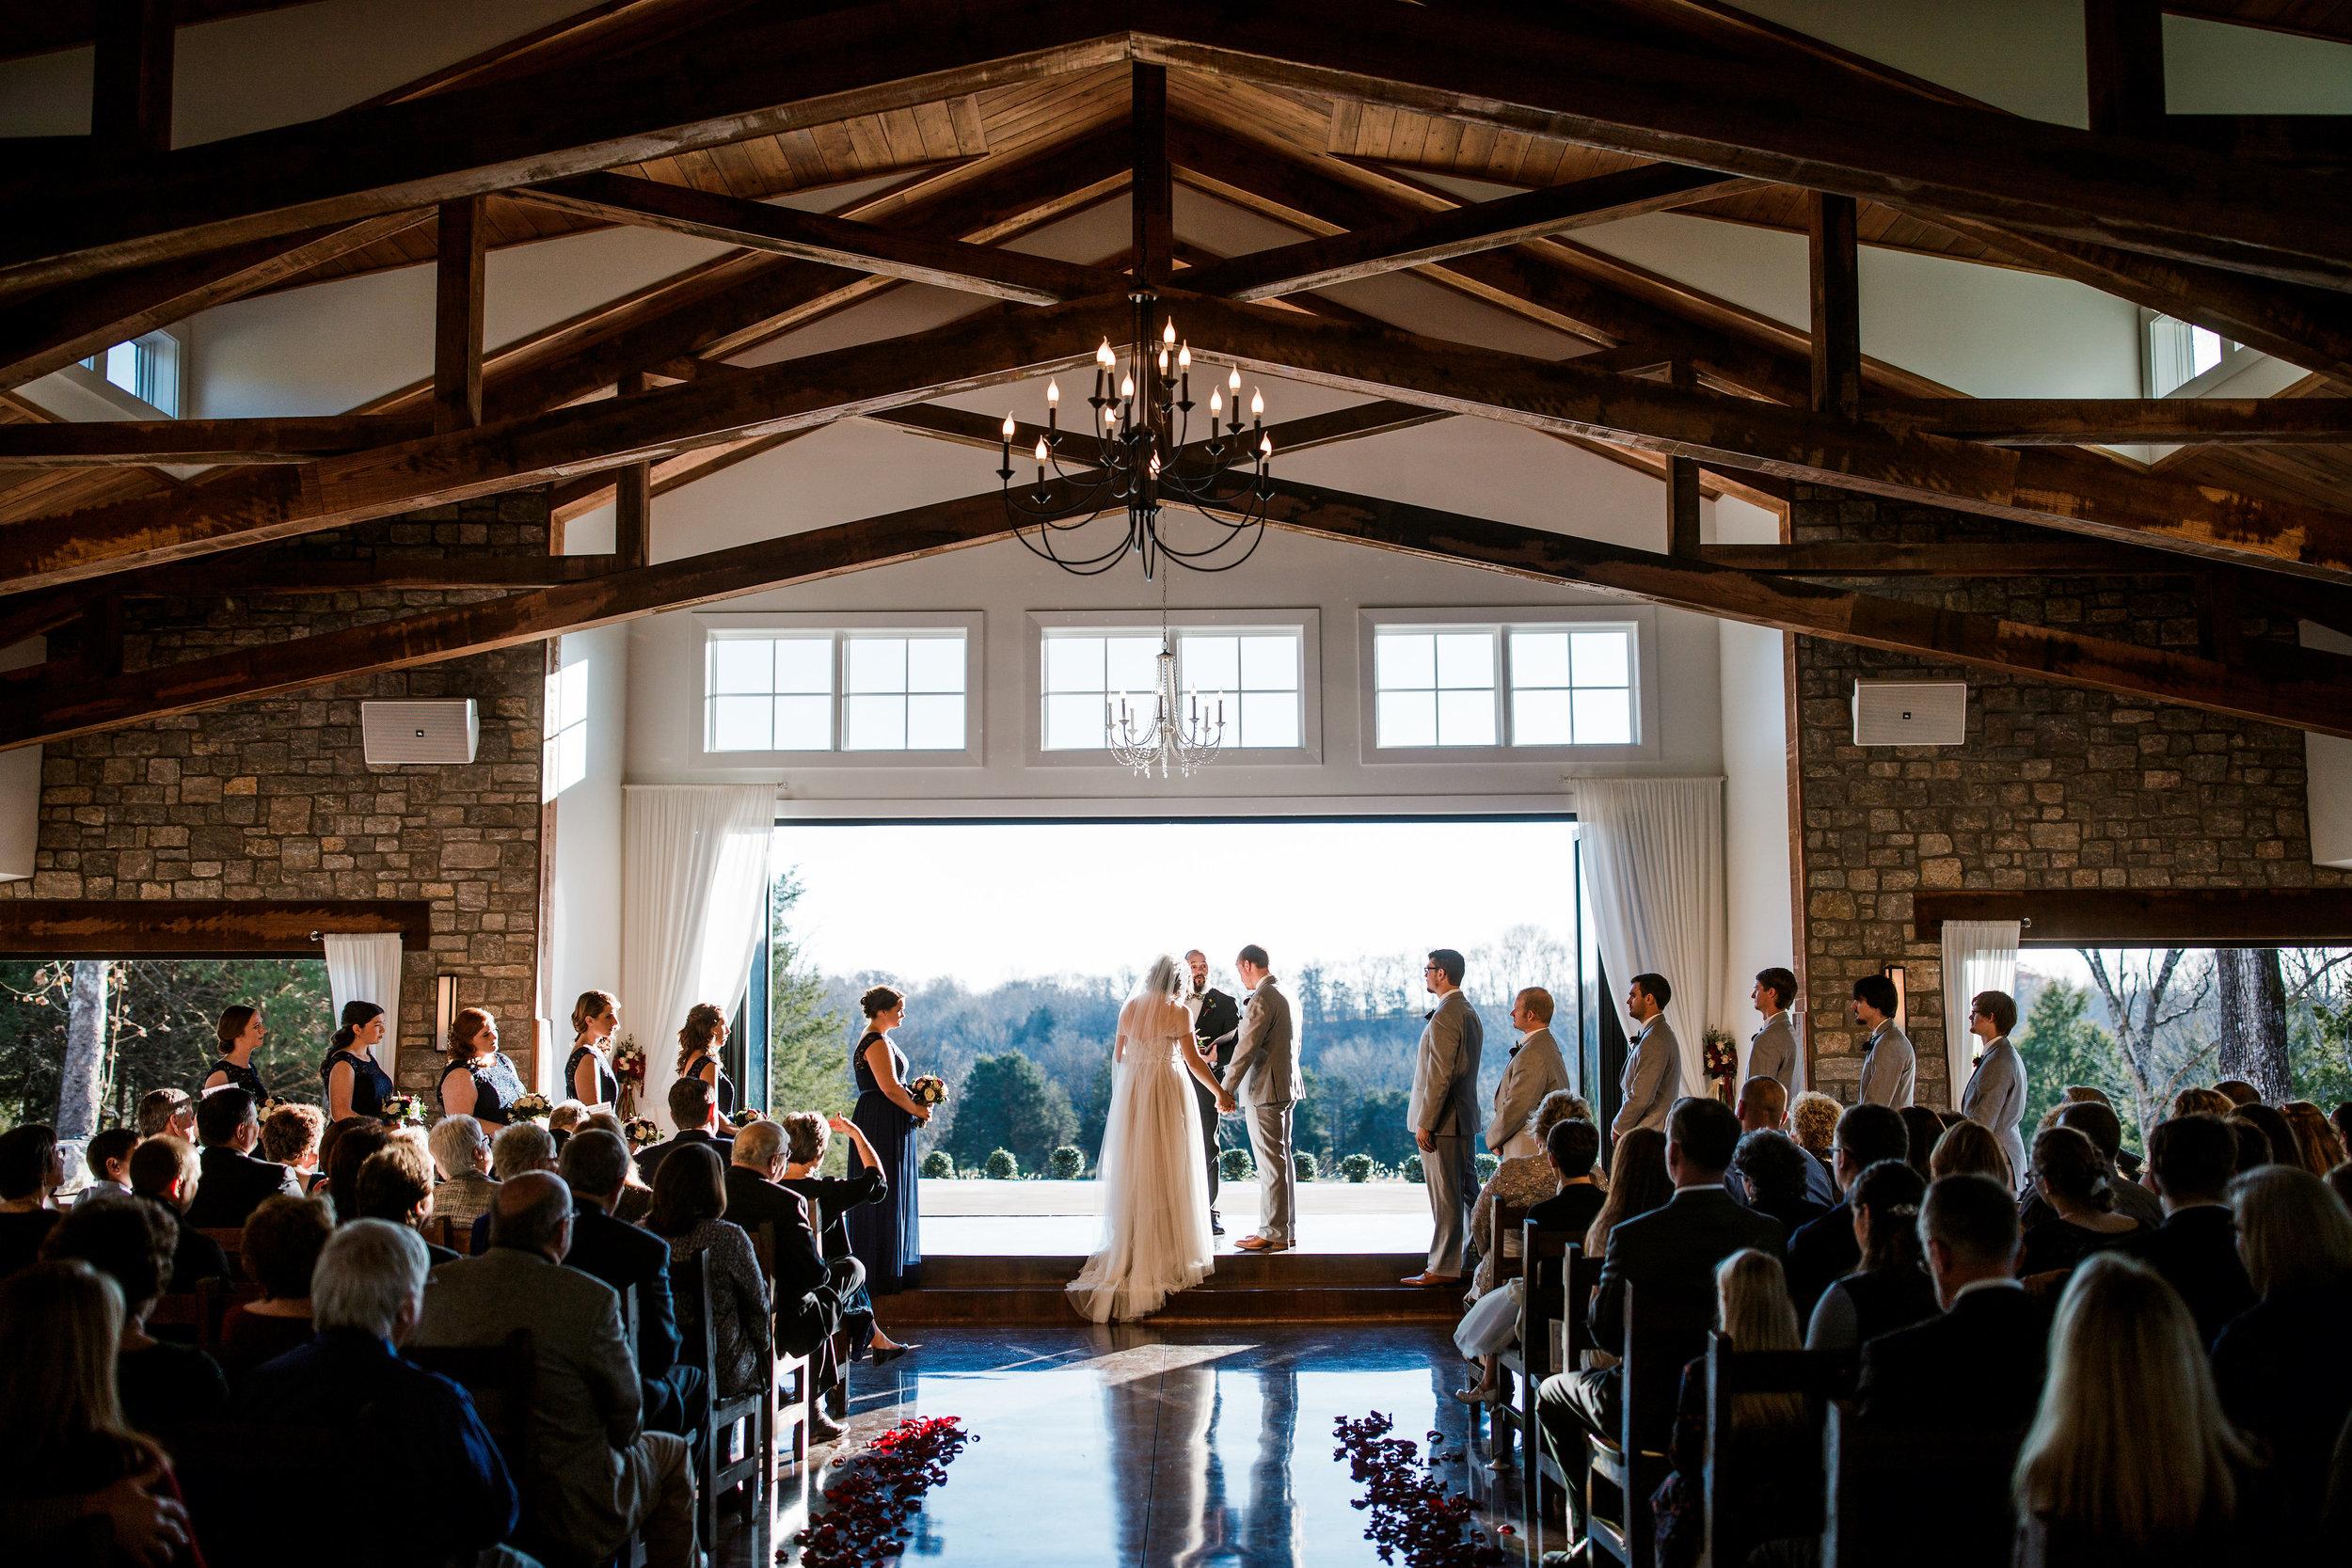 Graystone-Quarry-Wedding 47.jpg